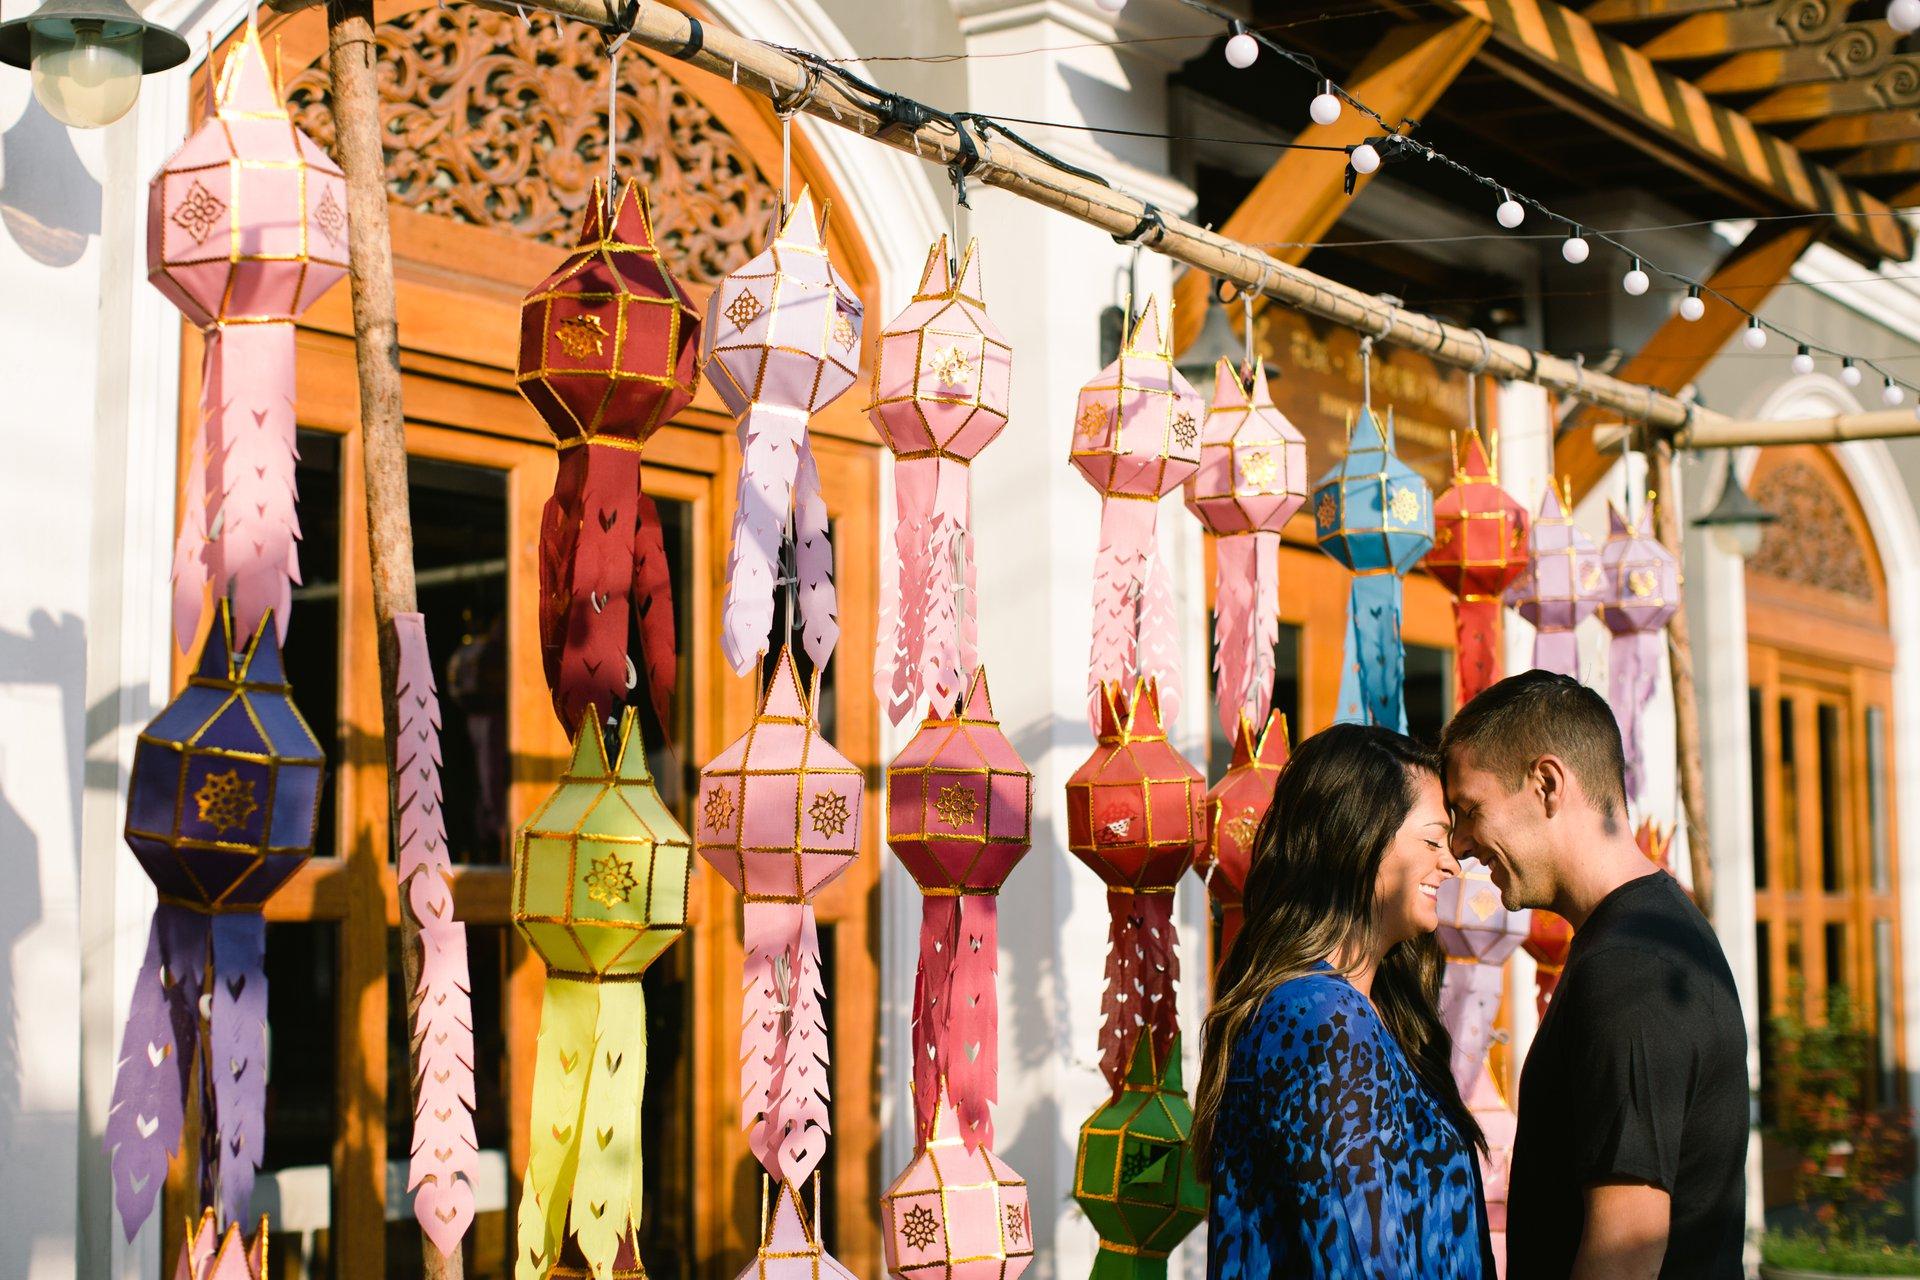 Flytographer Travel Story - New Years Lantern Festival in Thailand